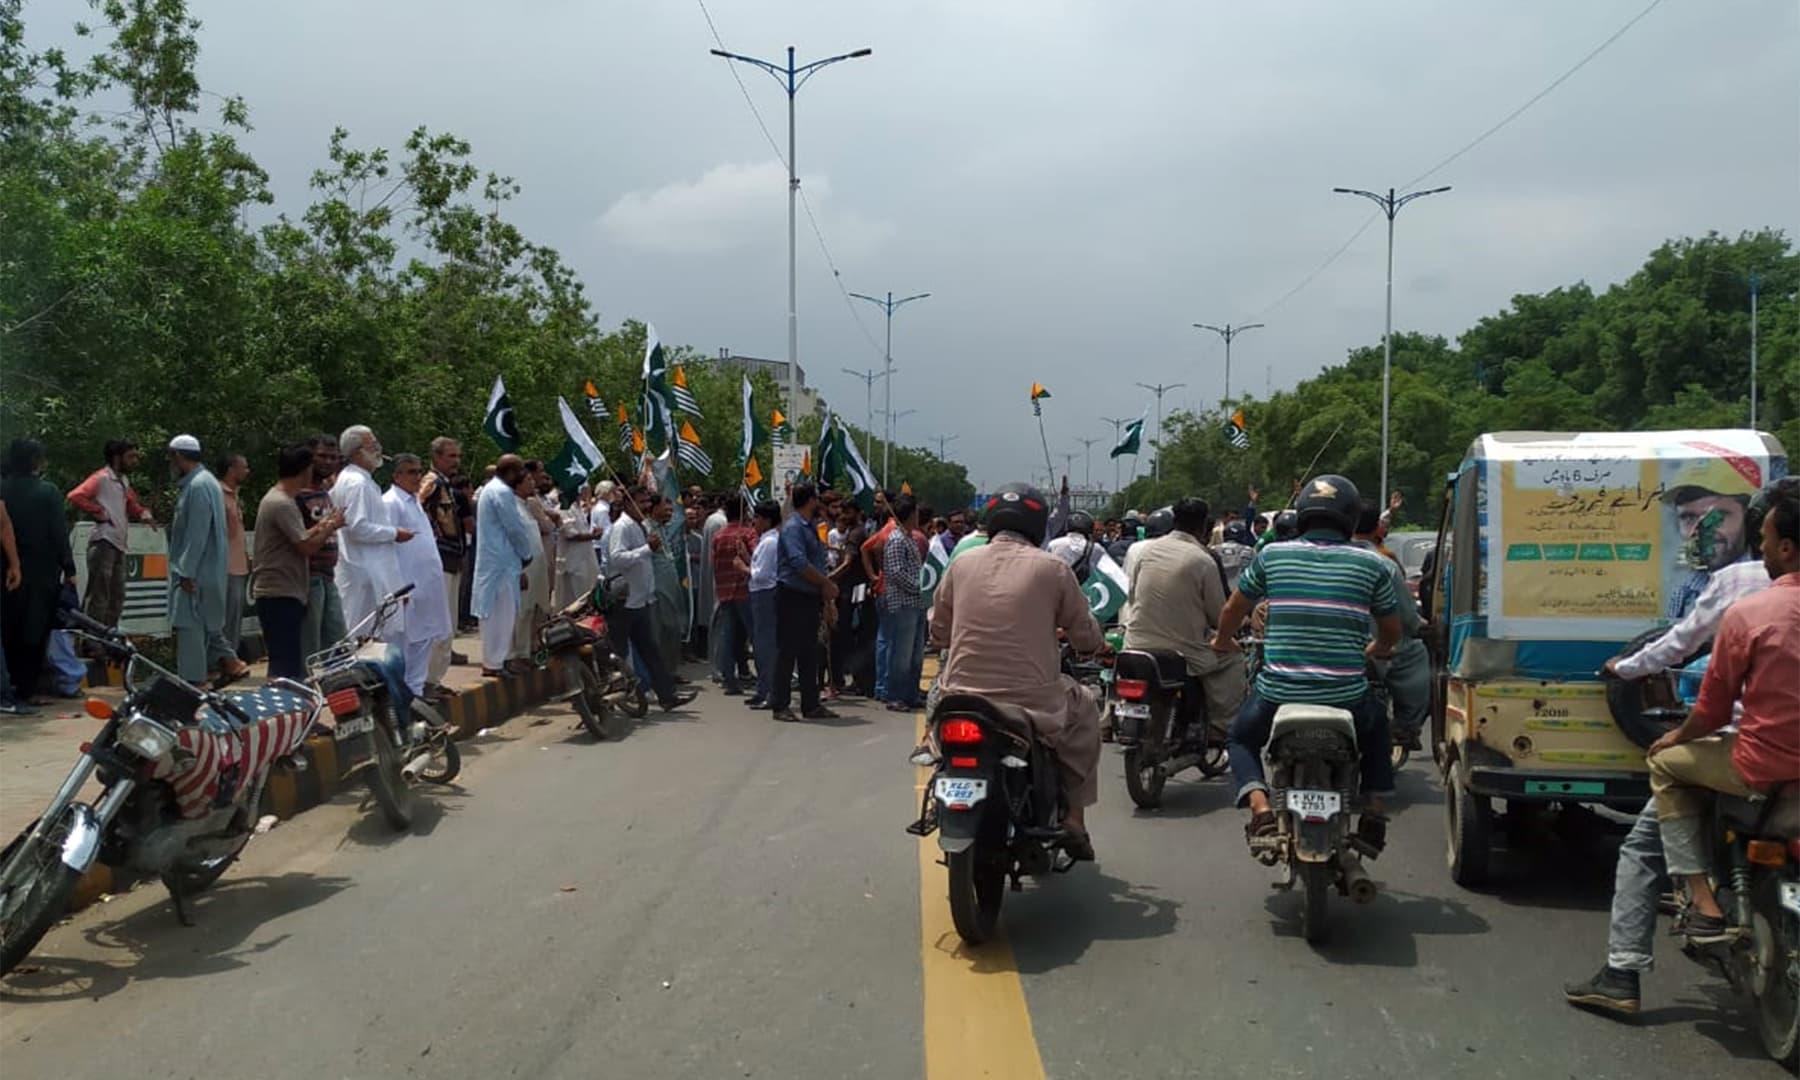 Citizens hold the Pakistani and Kashmiri flags in a demonstration on Karachi's Sharea Faisal. — Photo: Dawn.com